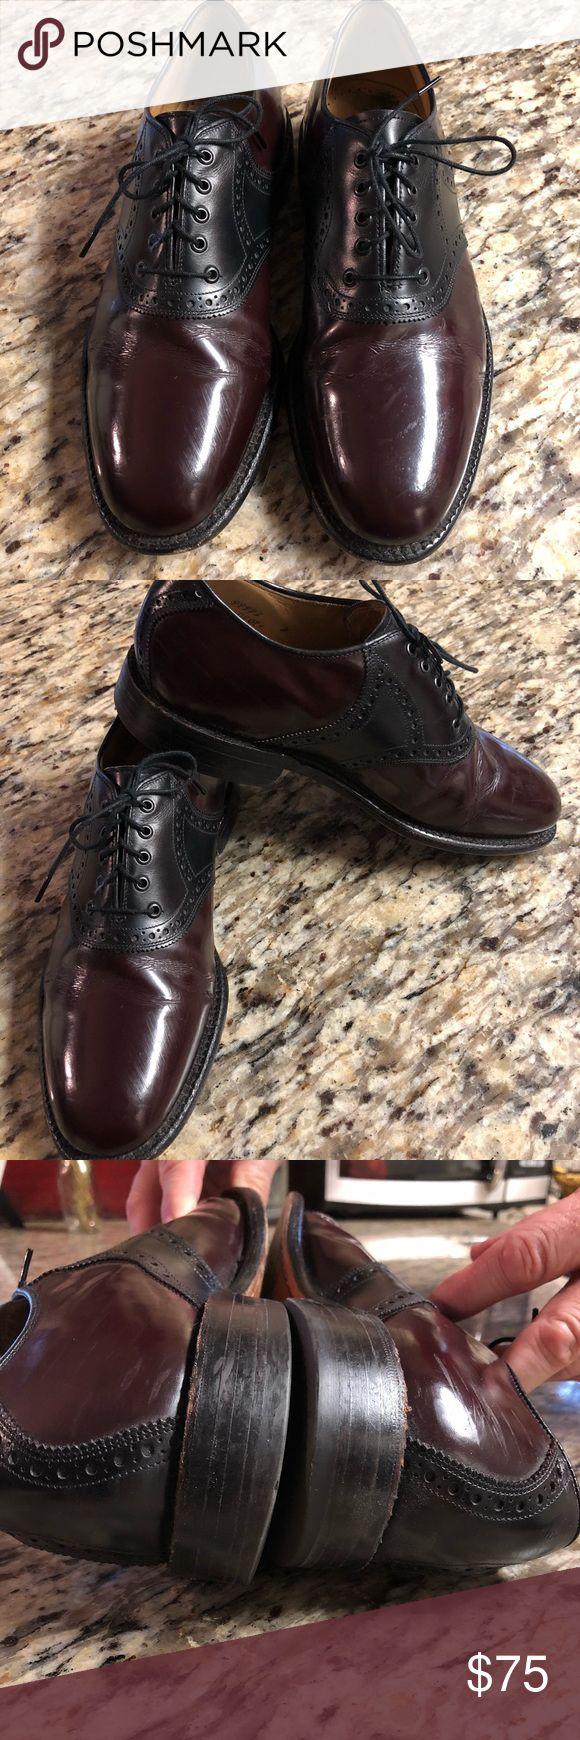 Men's Johnston & Murphy  Saddle Oxford Men's Johnston & Murphy Saddle Oxford Shoes Size 8 Style: The Owen Cordovan and Black Saddle Oxford Excellent Condition Johnston & Murphy Shoes Oxfords & Derbys #oxfordshoes